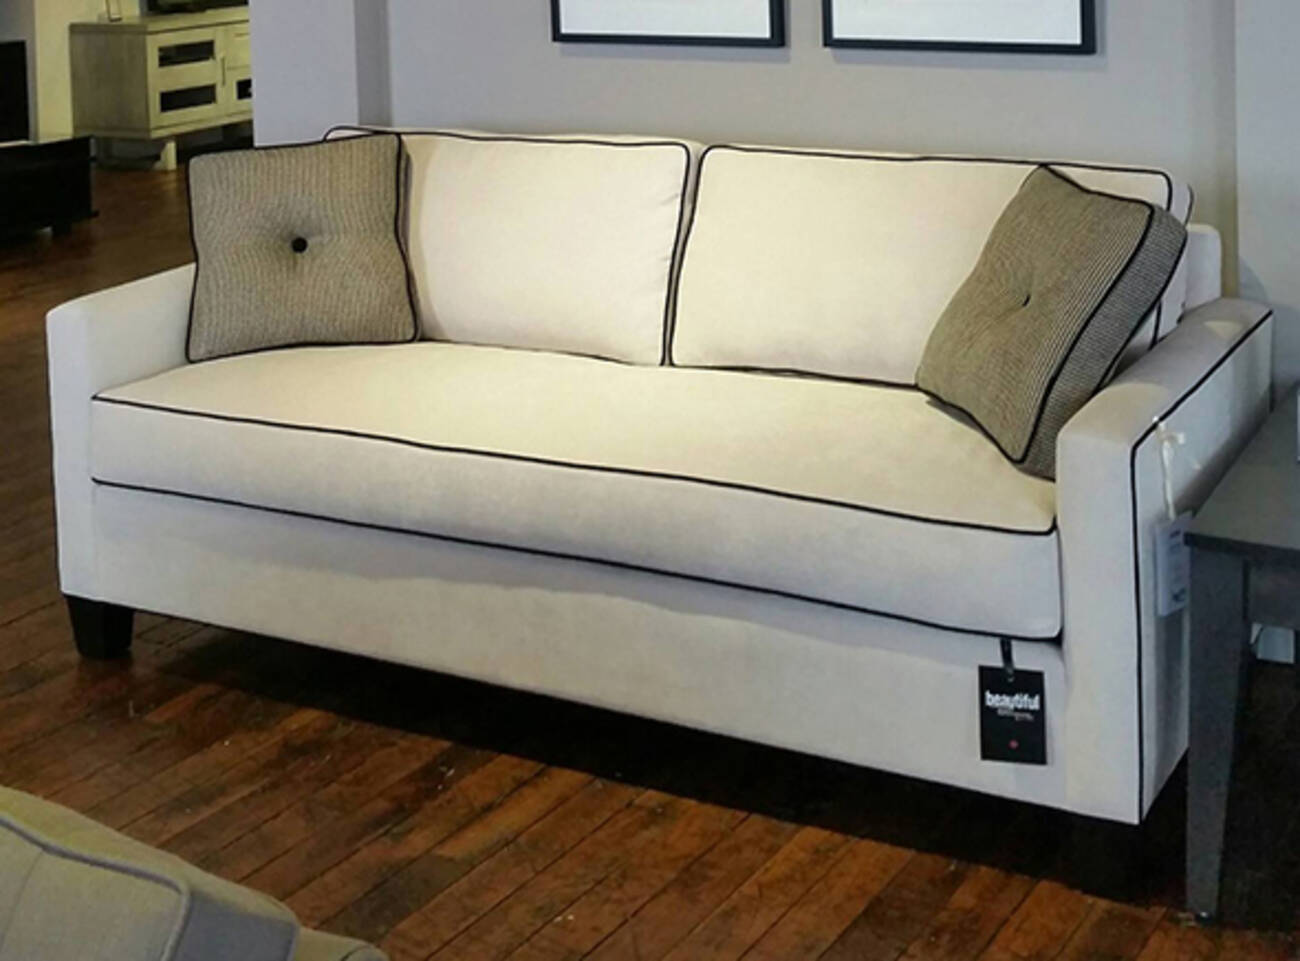 Barrymore furniture blogto toronto for Q furniture toronto